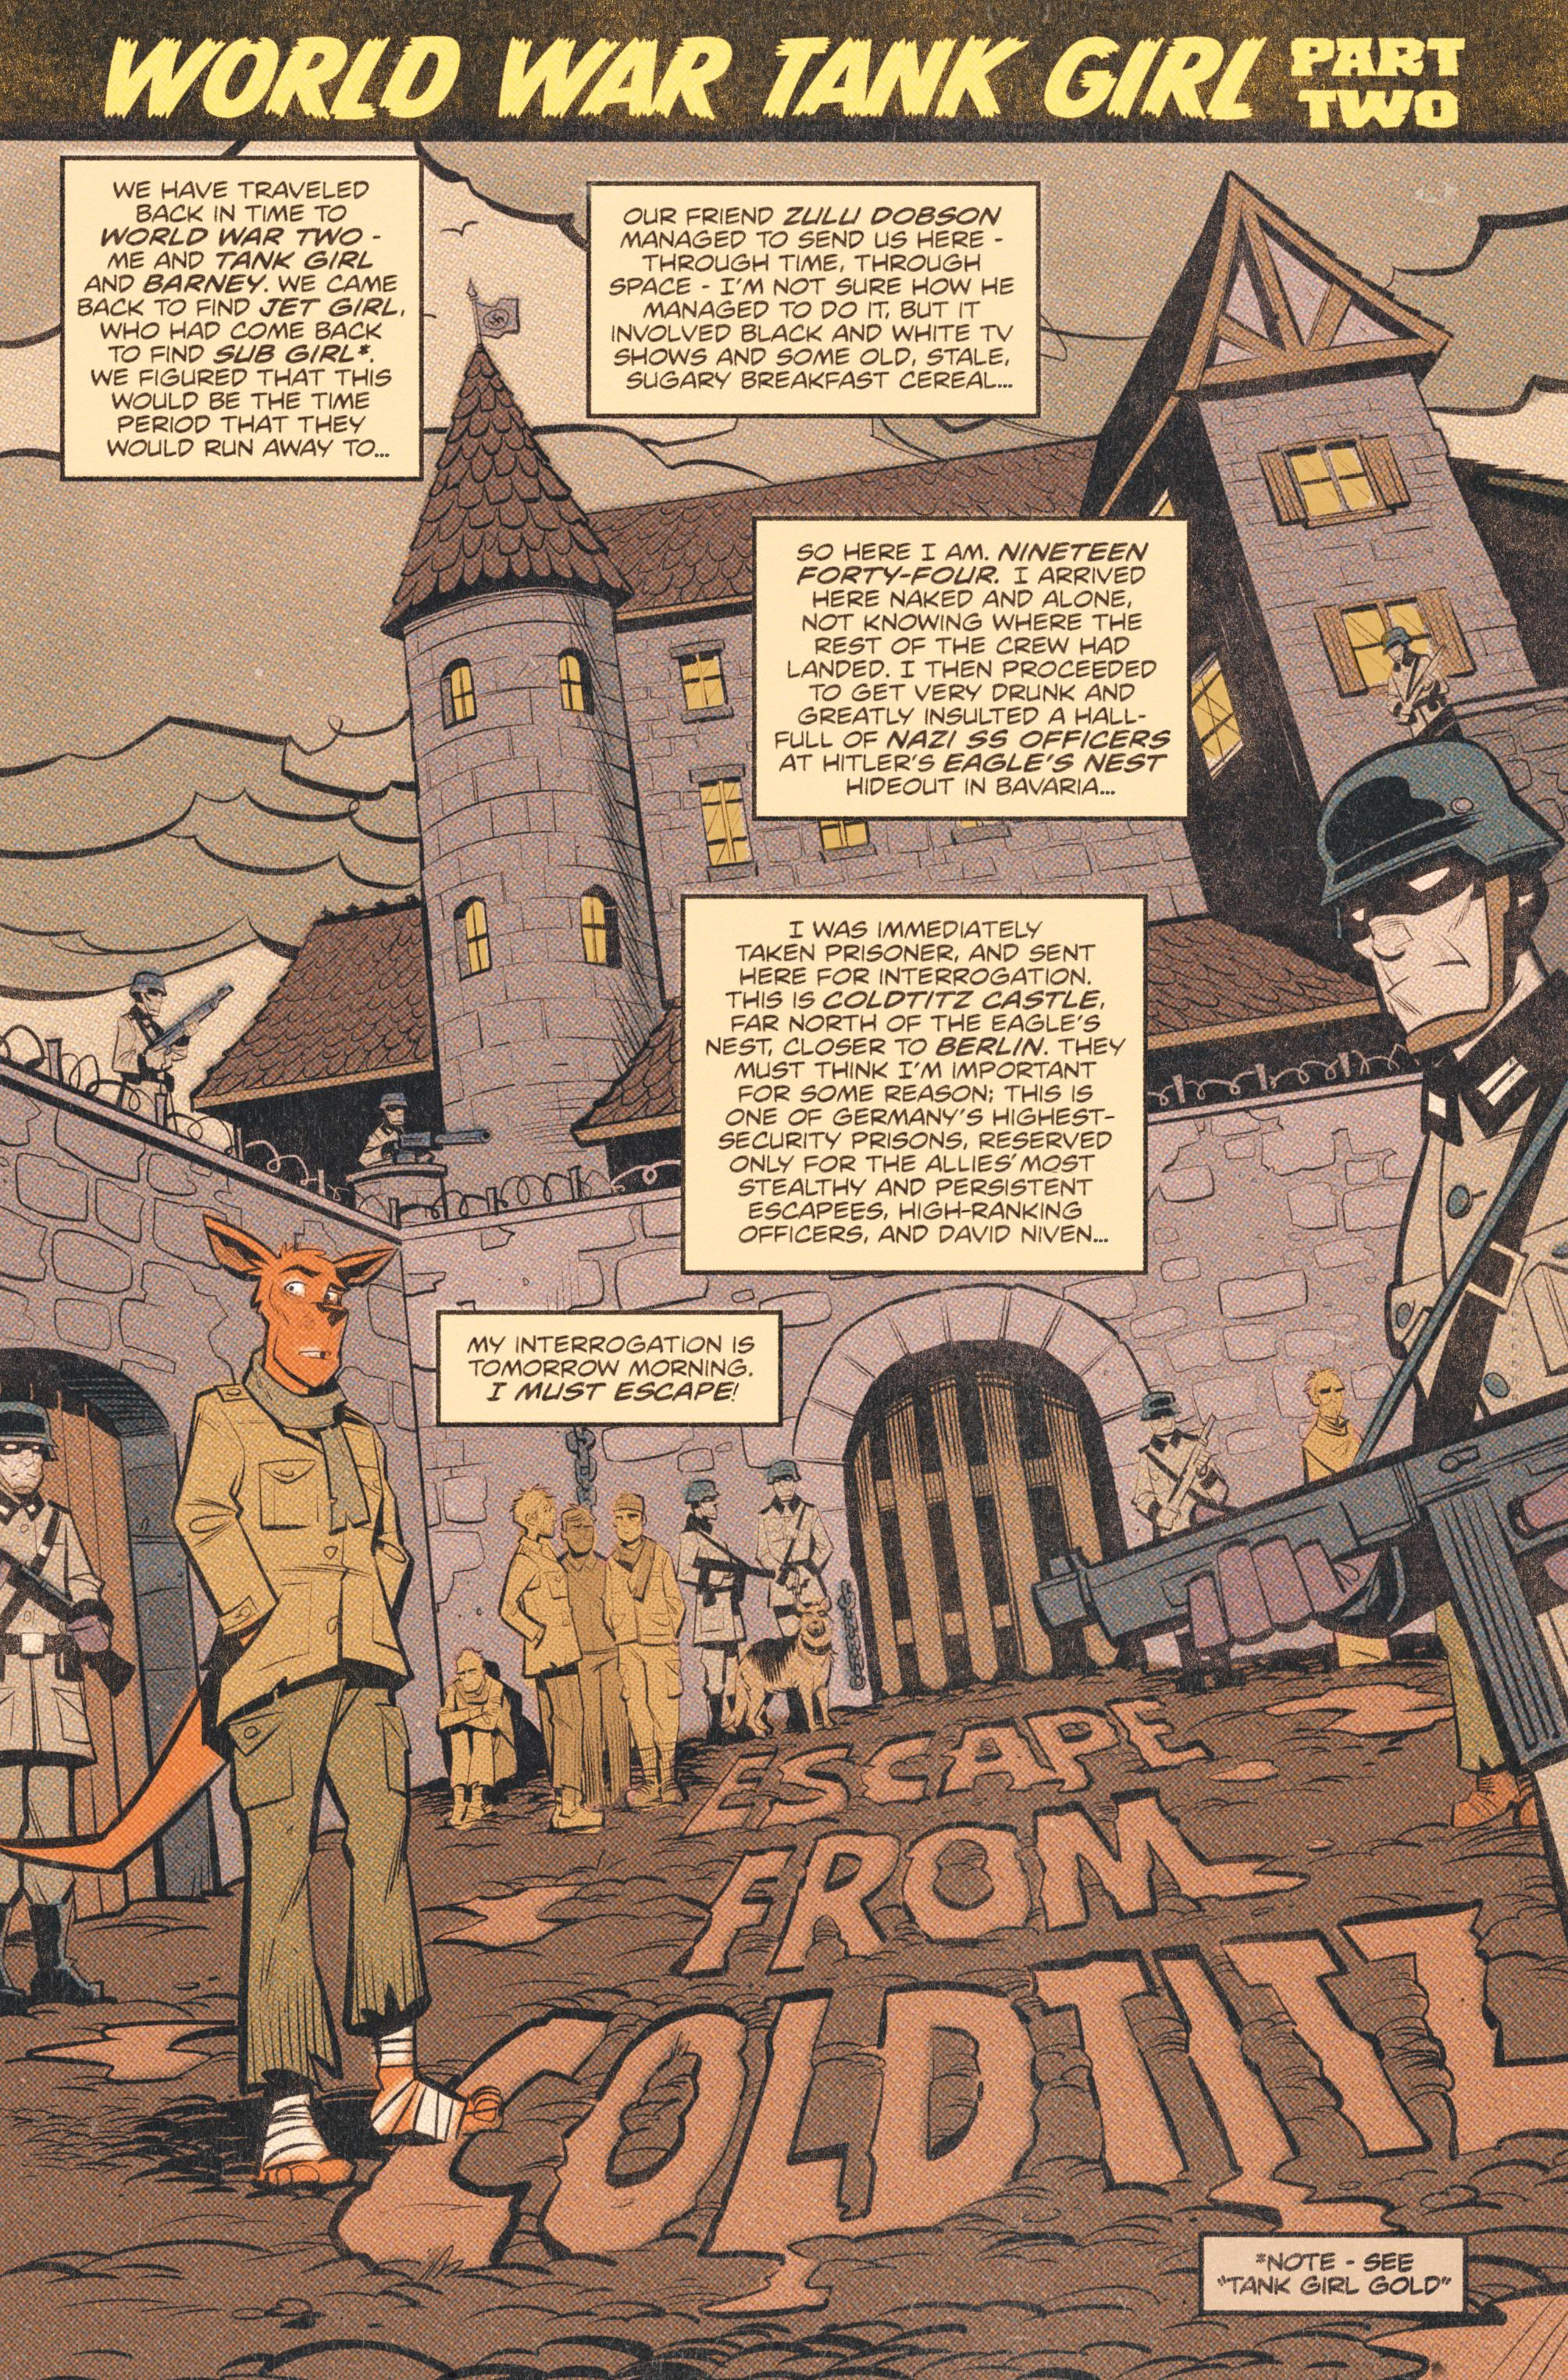 Read online Tank Girl: World War Tank Girl comic -  Issue #2 - 3